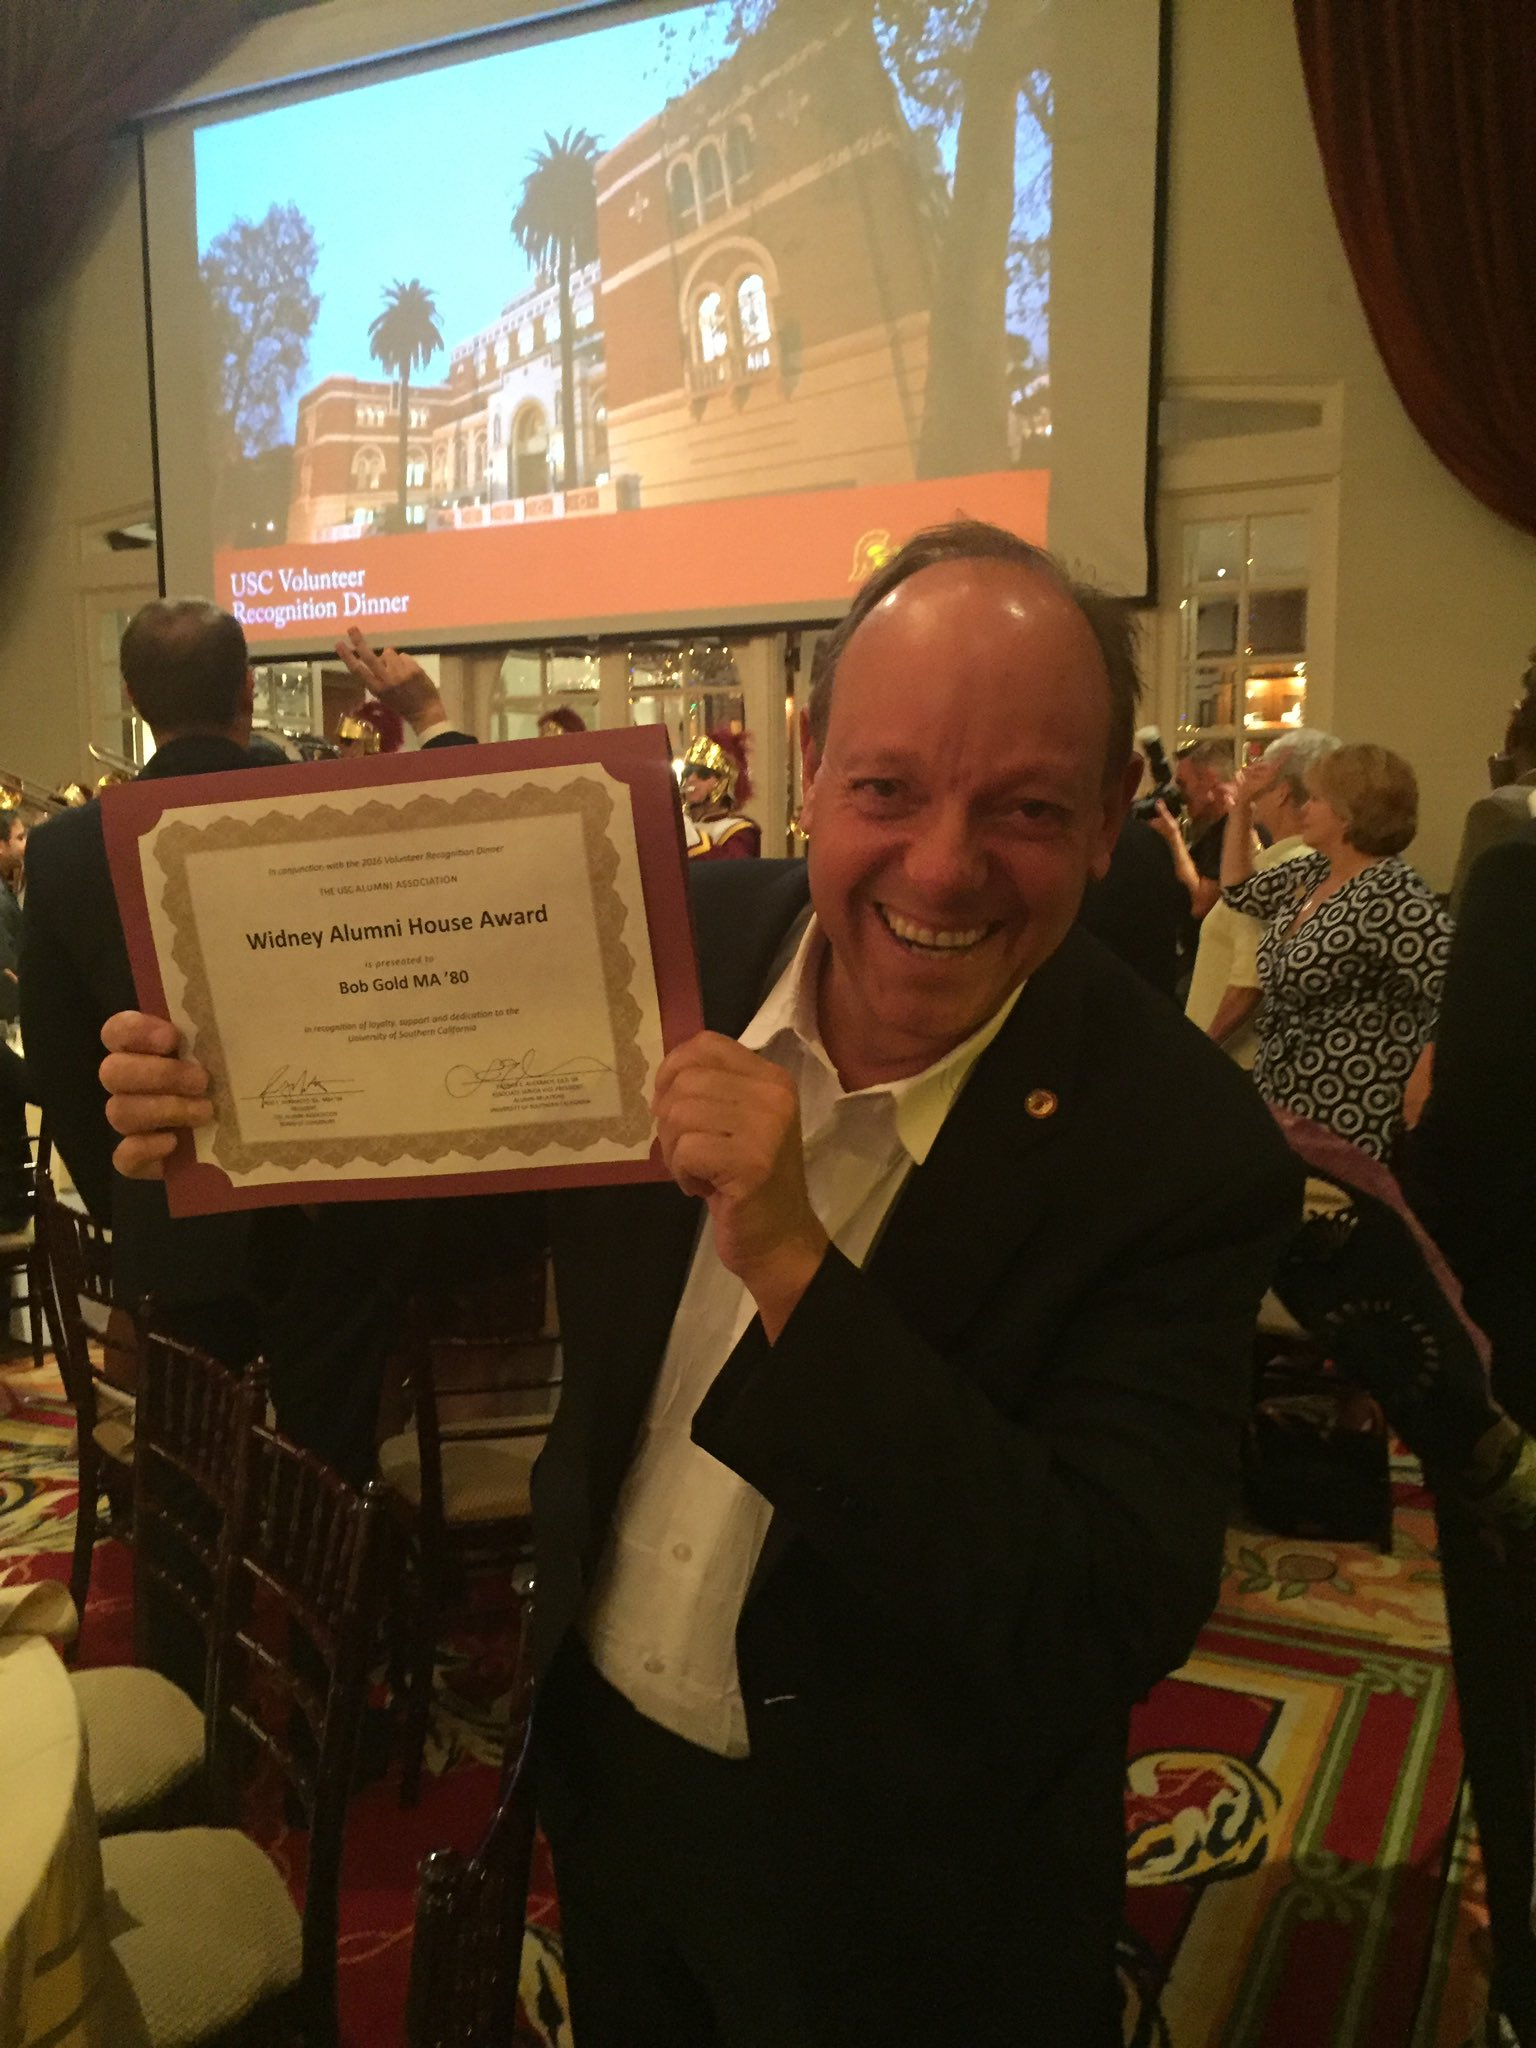 Congrats to Widney Alumni House Awardee, @bobgoldinla! @USCAnnenberg & @USCAlumni appreciates everything you do. ✌️ https://t.co/XYIWUlxLc7